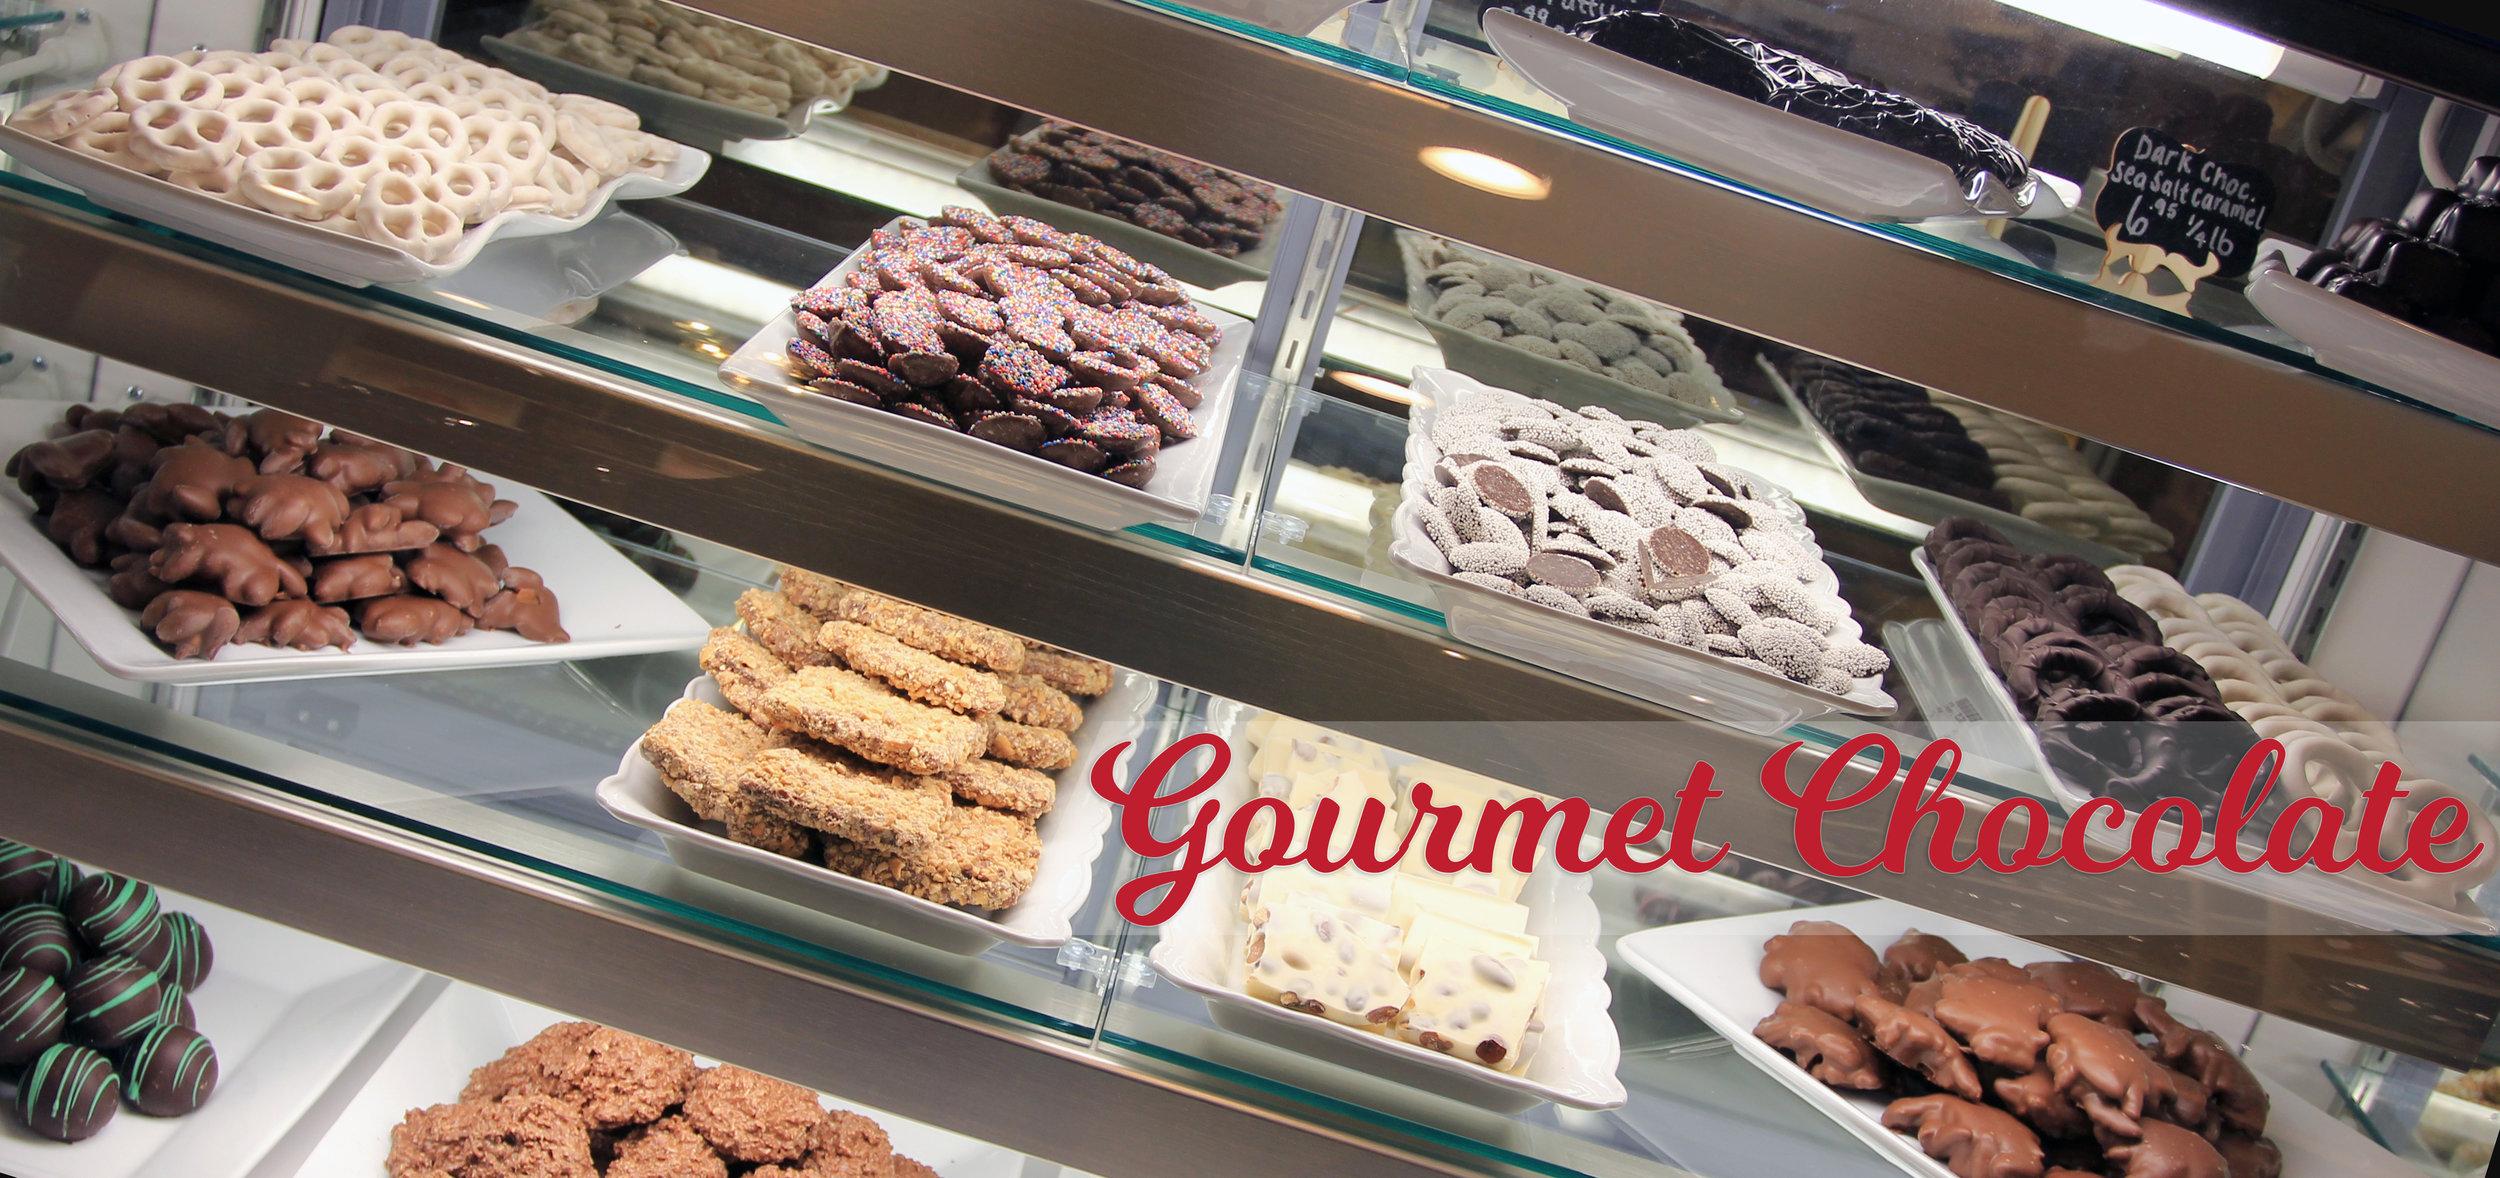 GourmetChocolate.jpg